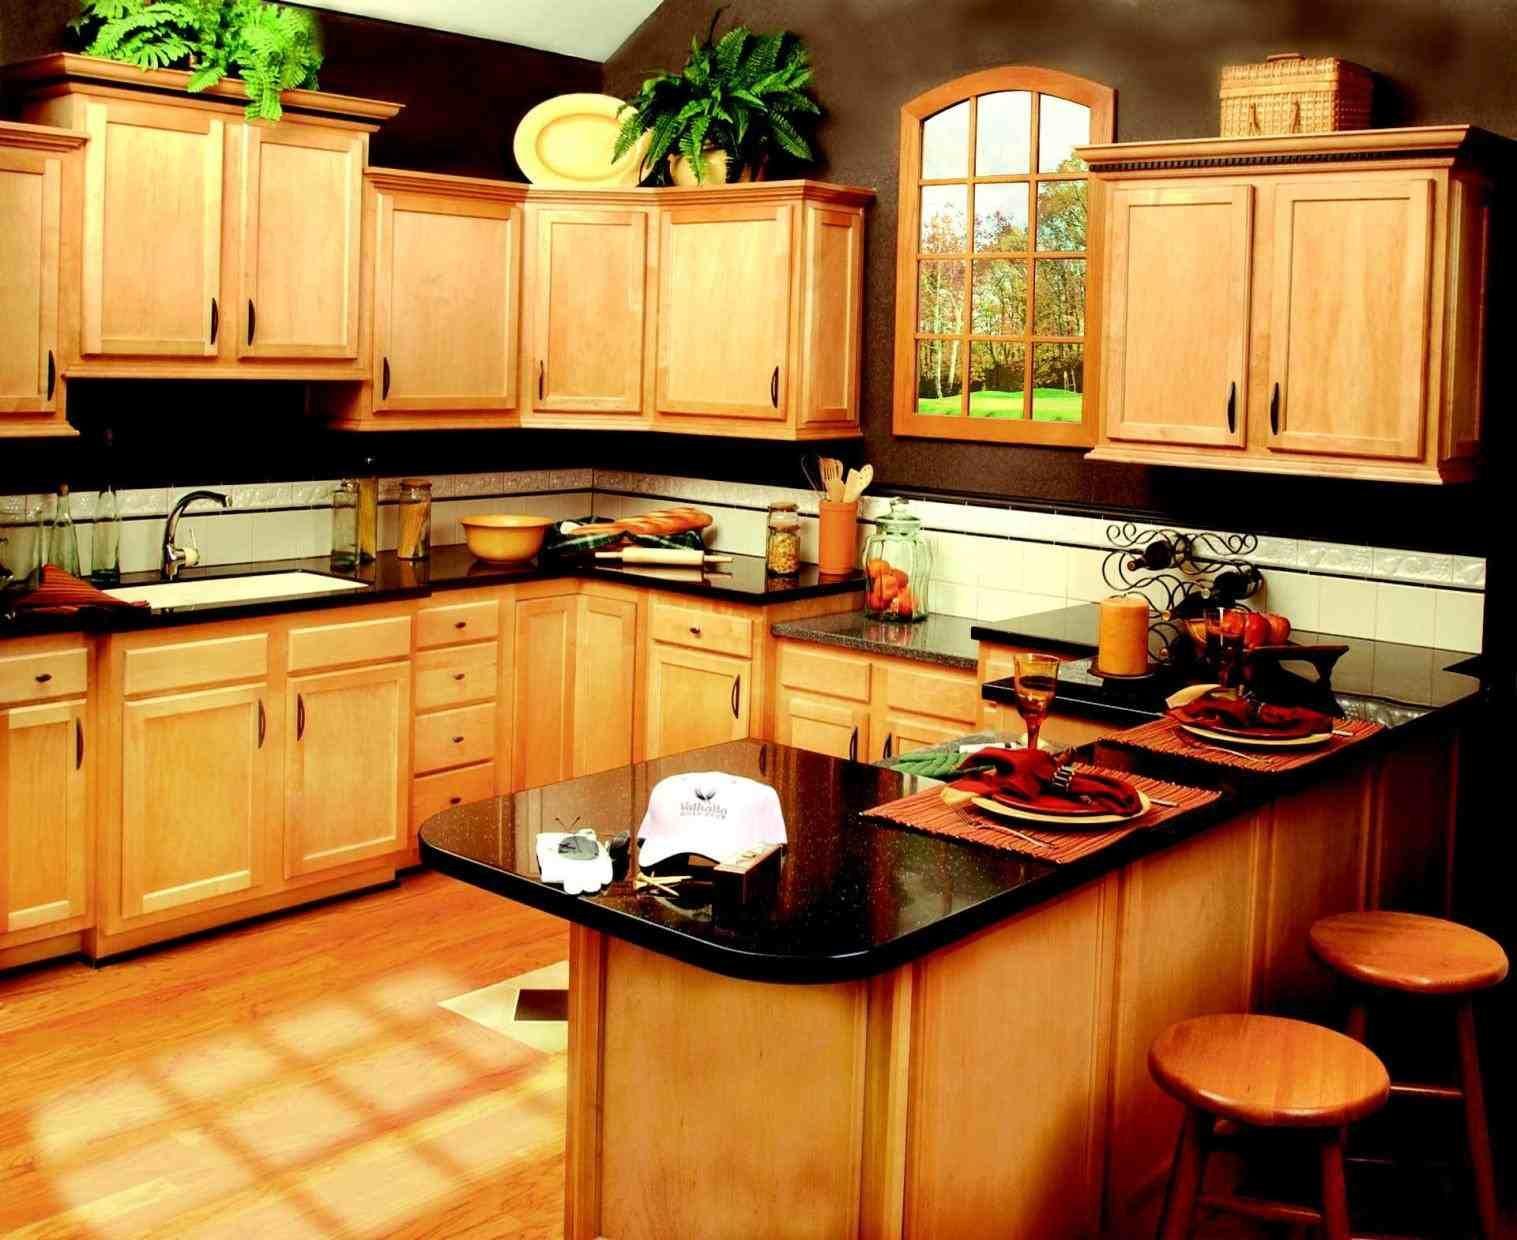 new post simple house interior design kitchen visit bobayule trending decors - House Interior Design Kitchen